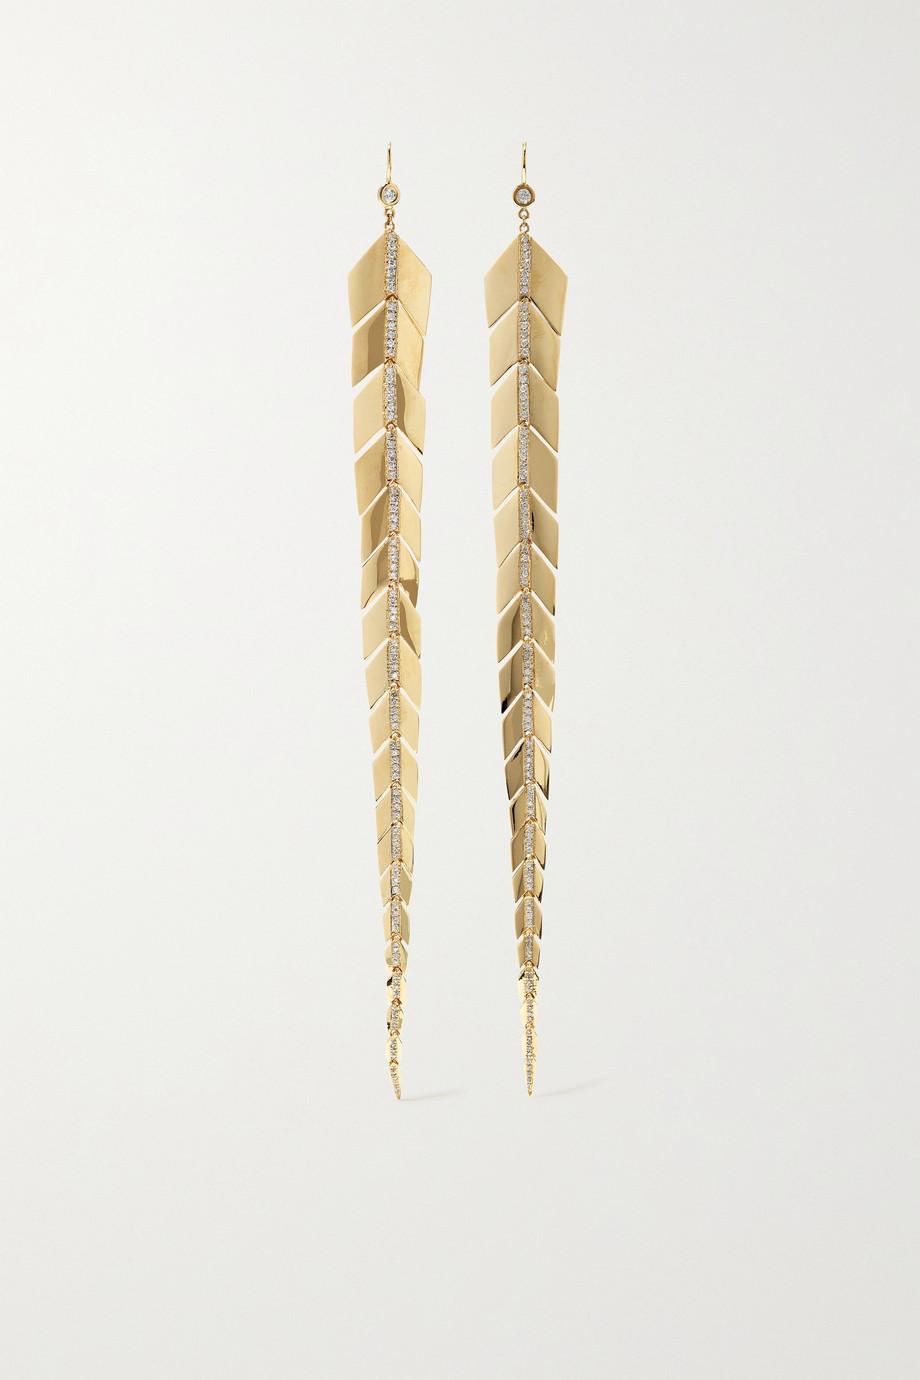 Jacquie Aiche Extra Large Fishtail 14-karat gold diamond earrings